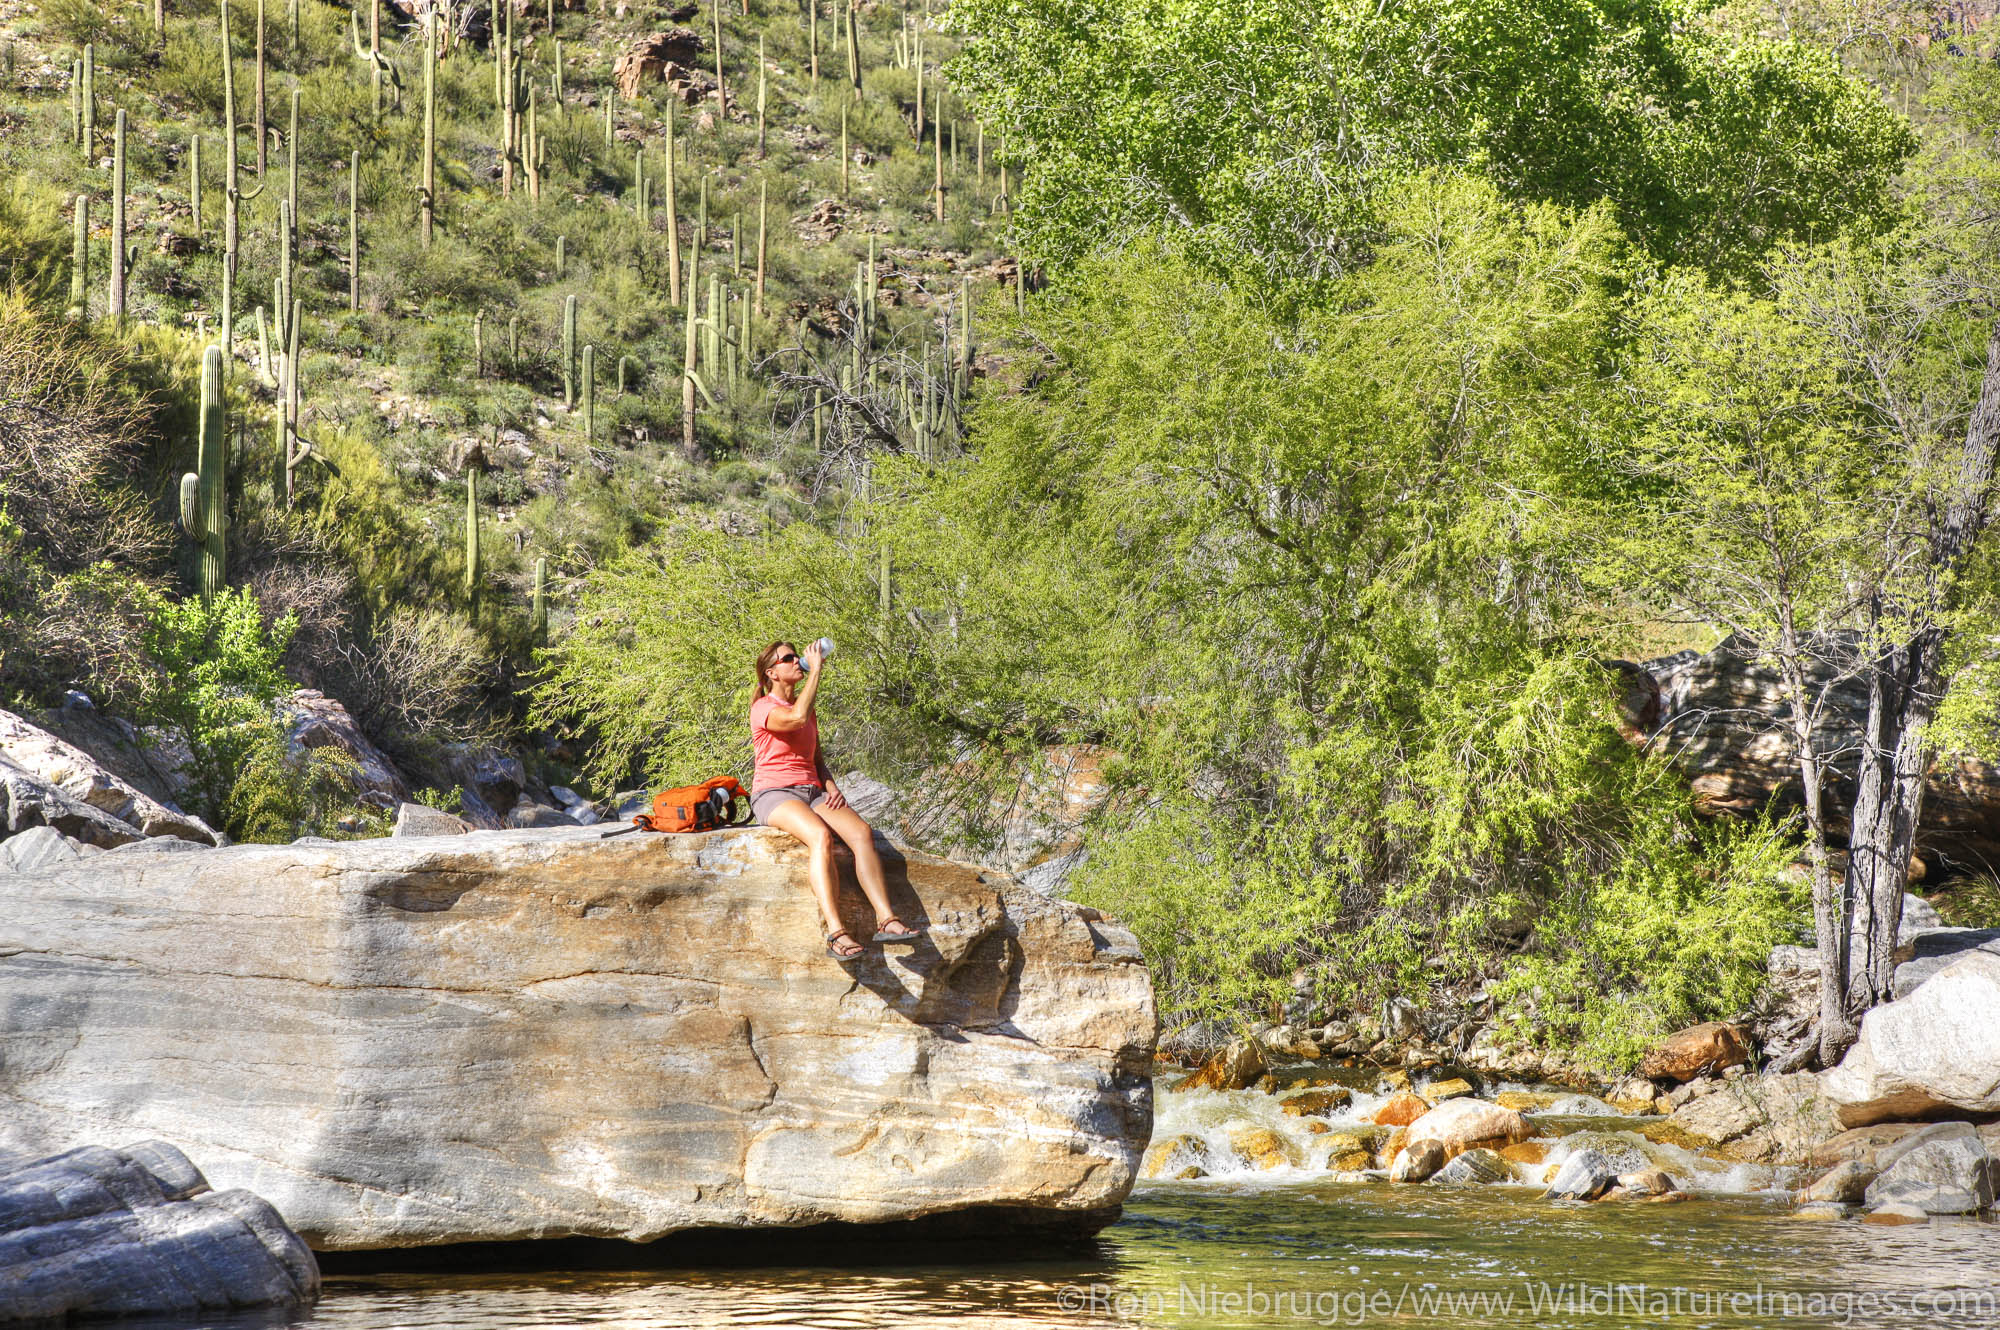 Hiker enjoying Sabino Creek, Sabino Canyon Recreation Area, Tucson, Arizona.  (model released)